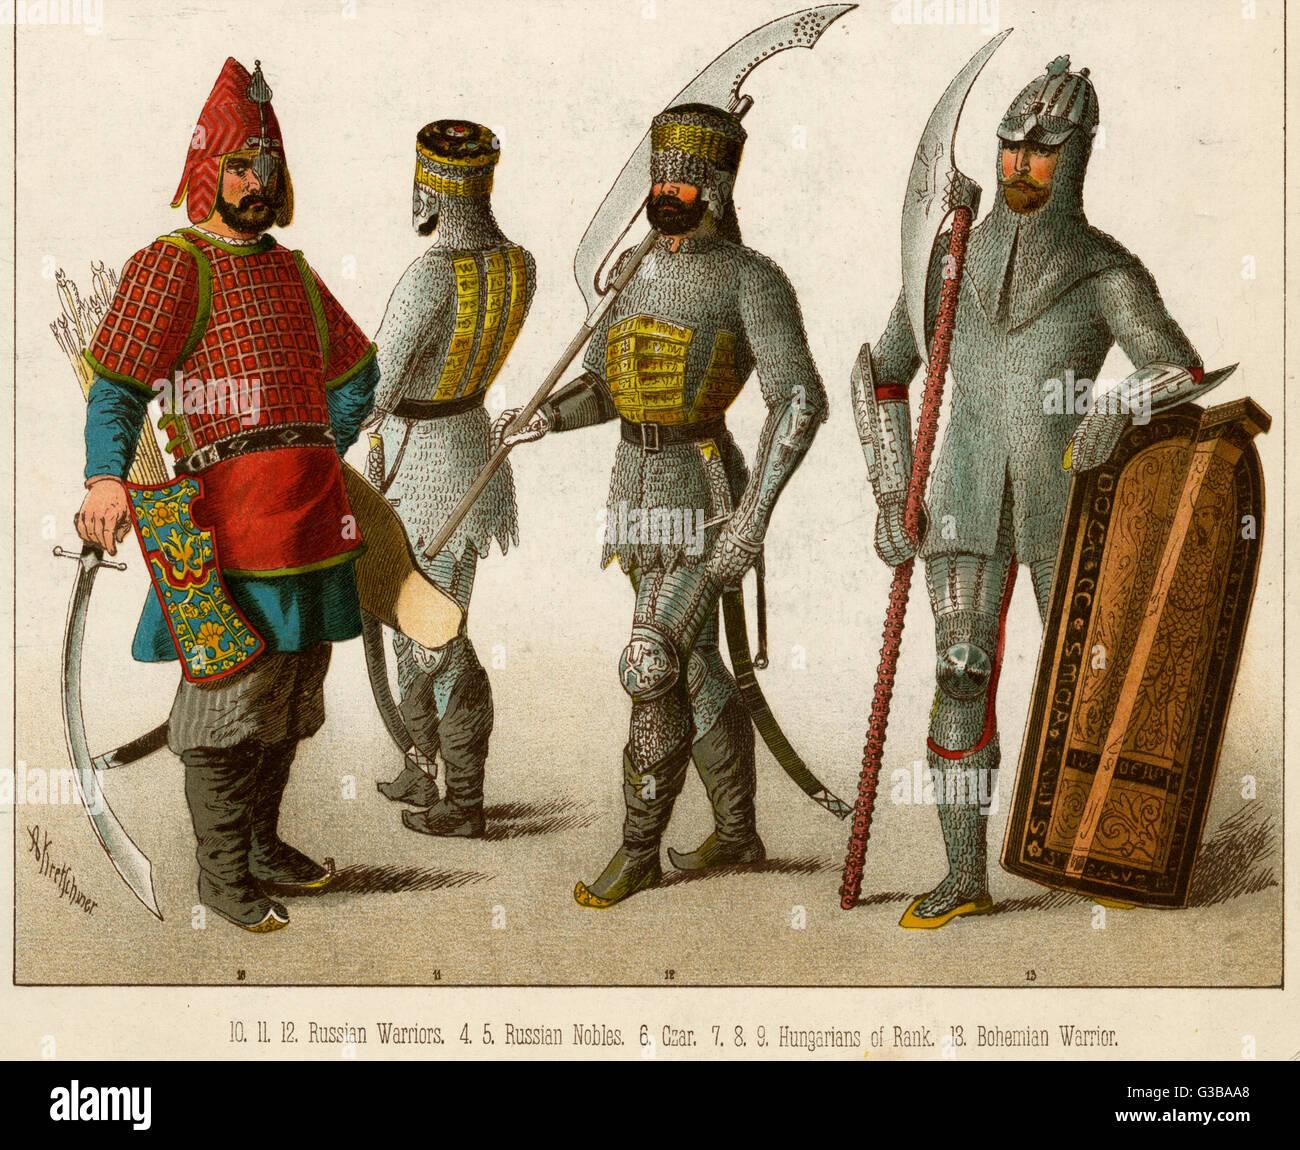 Slavonic Warriors         Date: - Stock Image